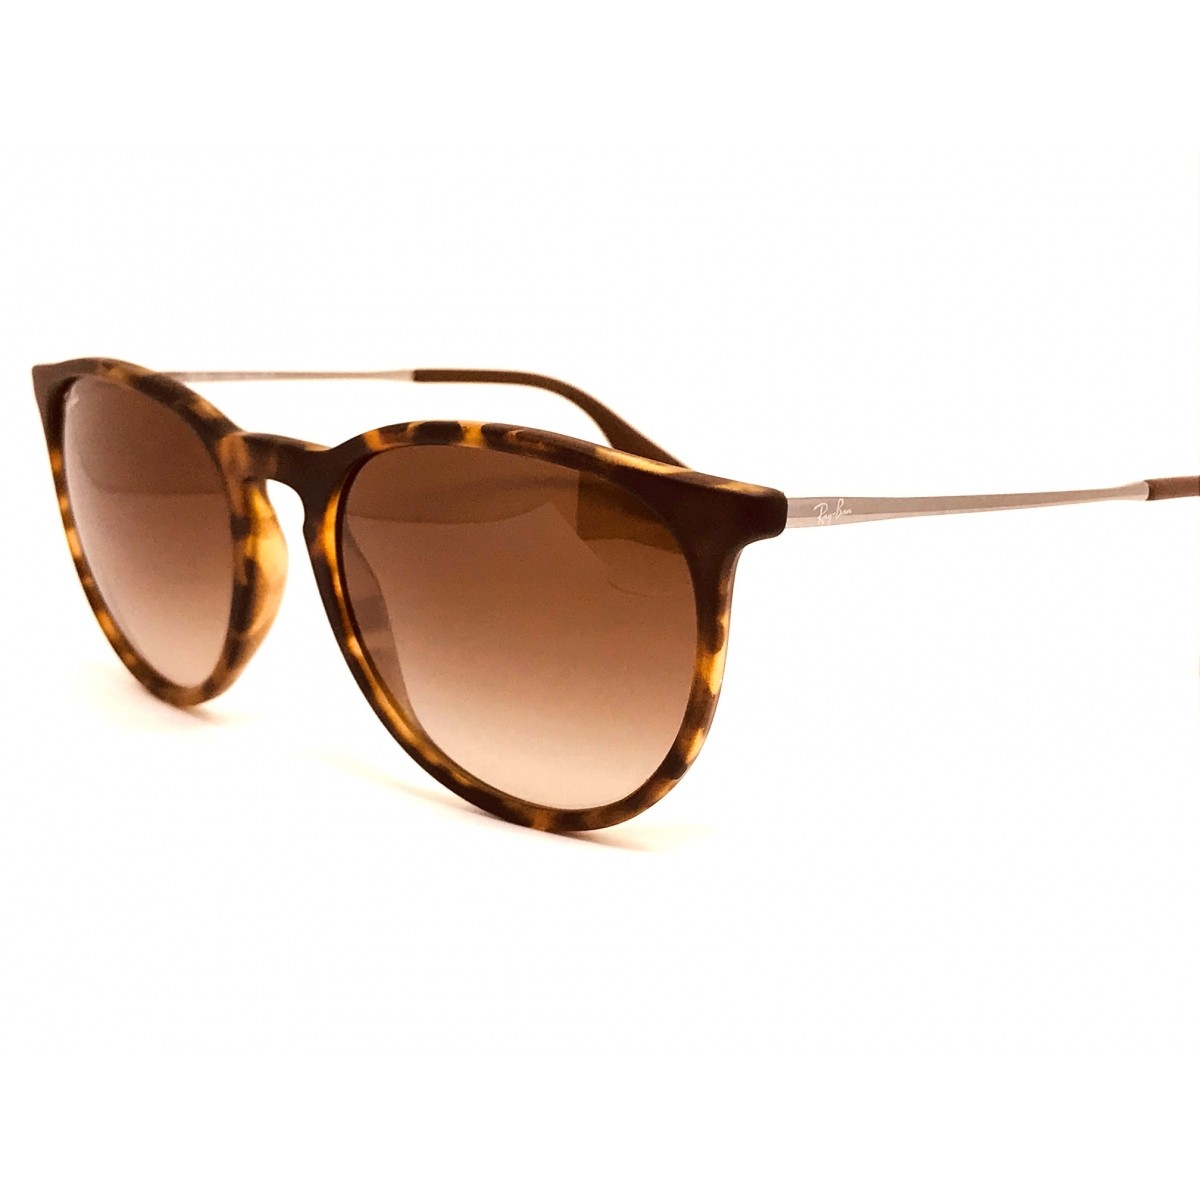 9f3d807b5cc7d ... oculos de sol Ray Ban Erika RB 4171L 865 13 54 - Majestic Oculos